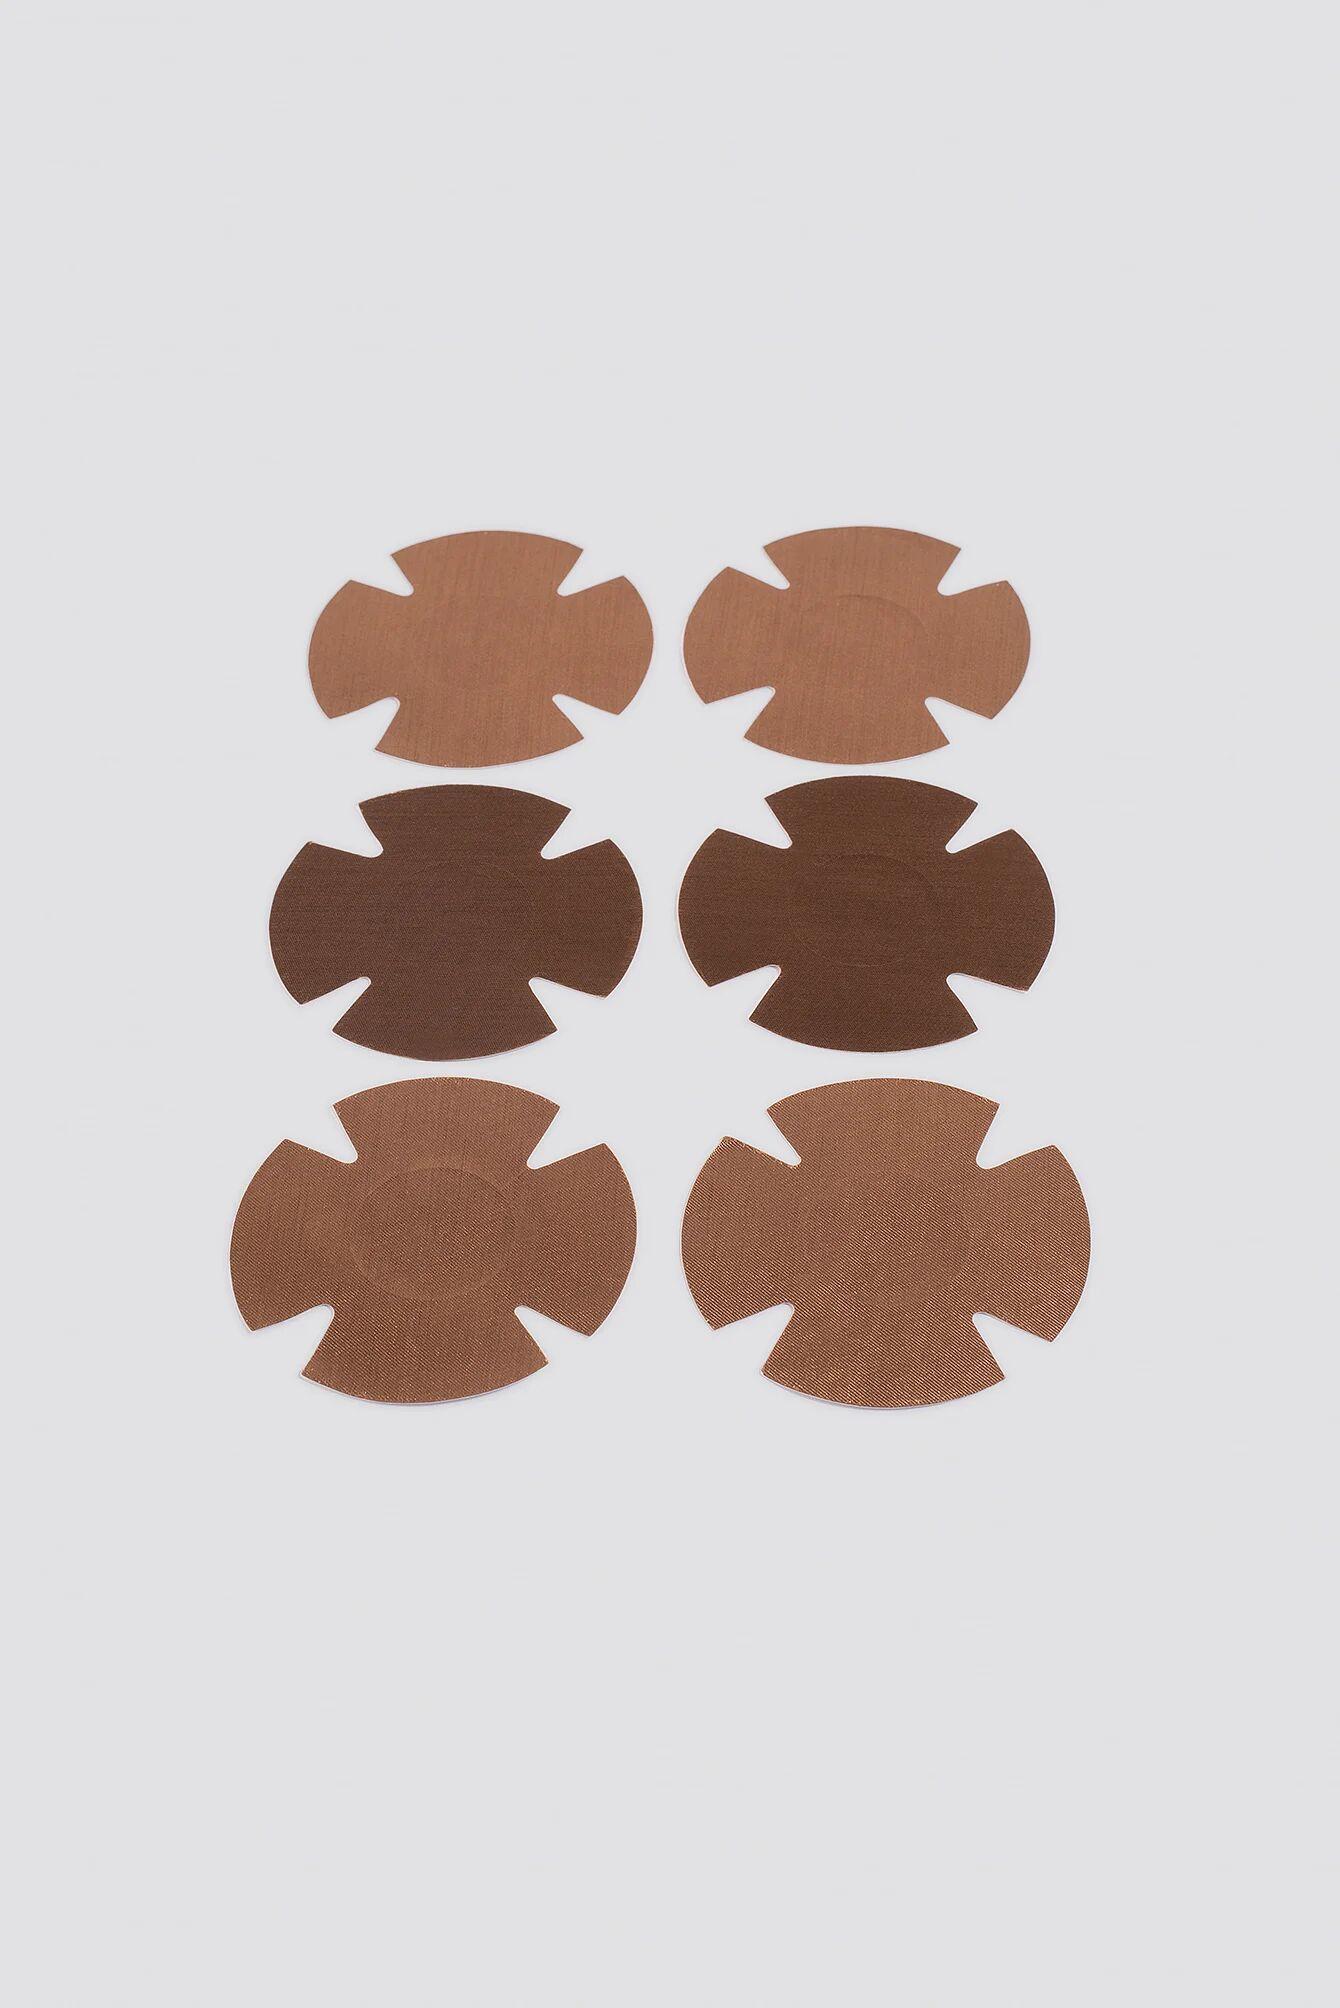 Freebra Thin Nipple Covers - Brown,Beige  - Size: One Size